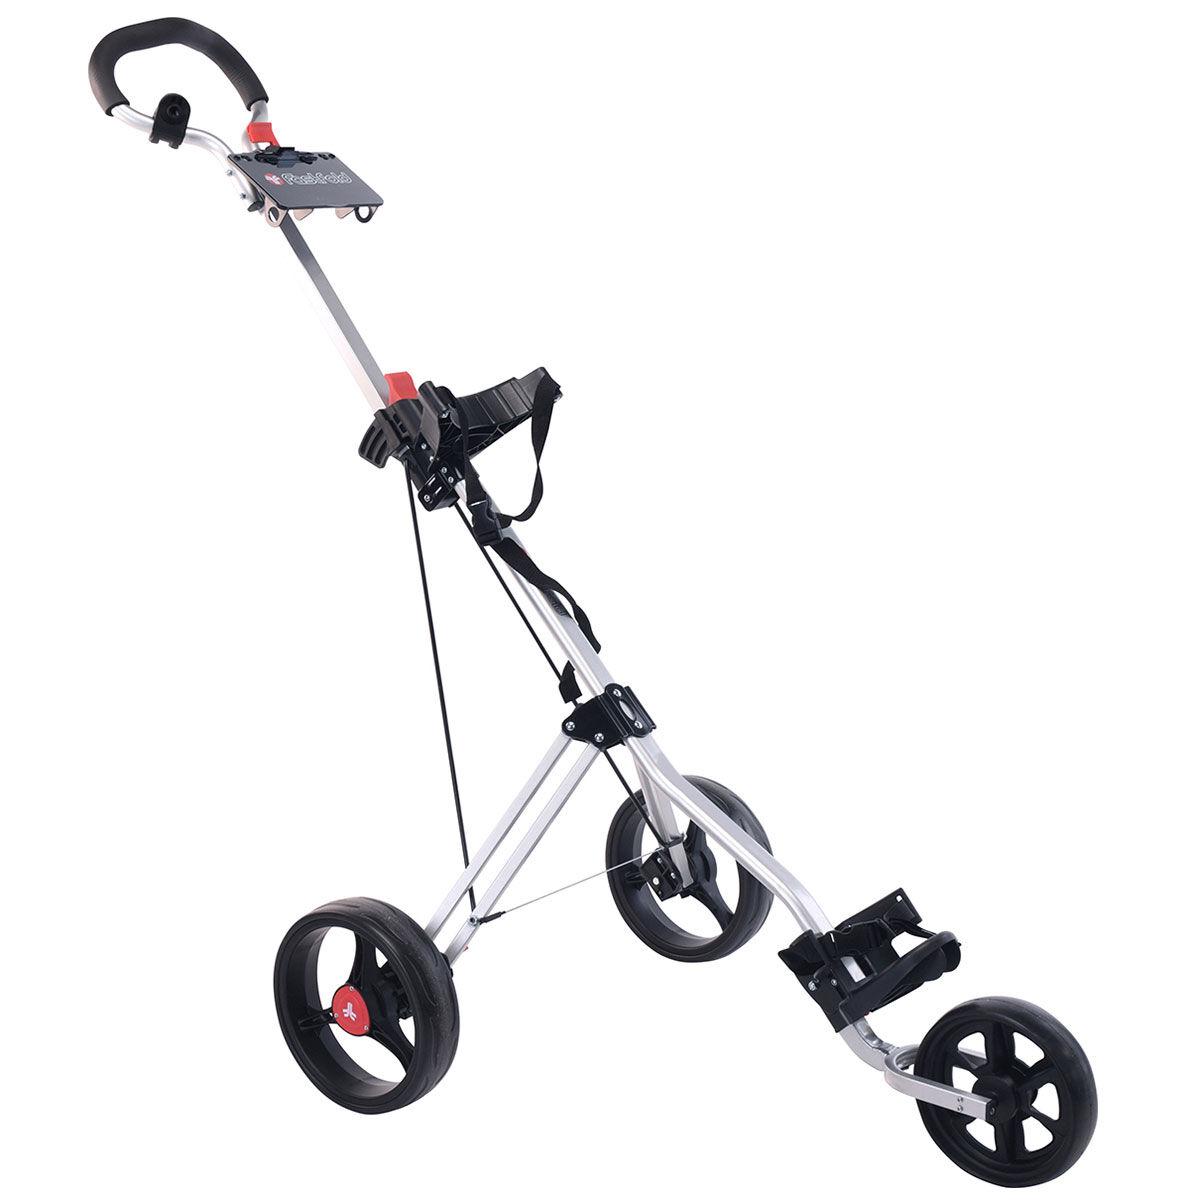 Fast Fold Silver FastFold Force Manual Golf Trolley, Size: One Size | American Golf | American Golf